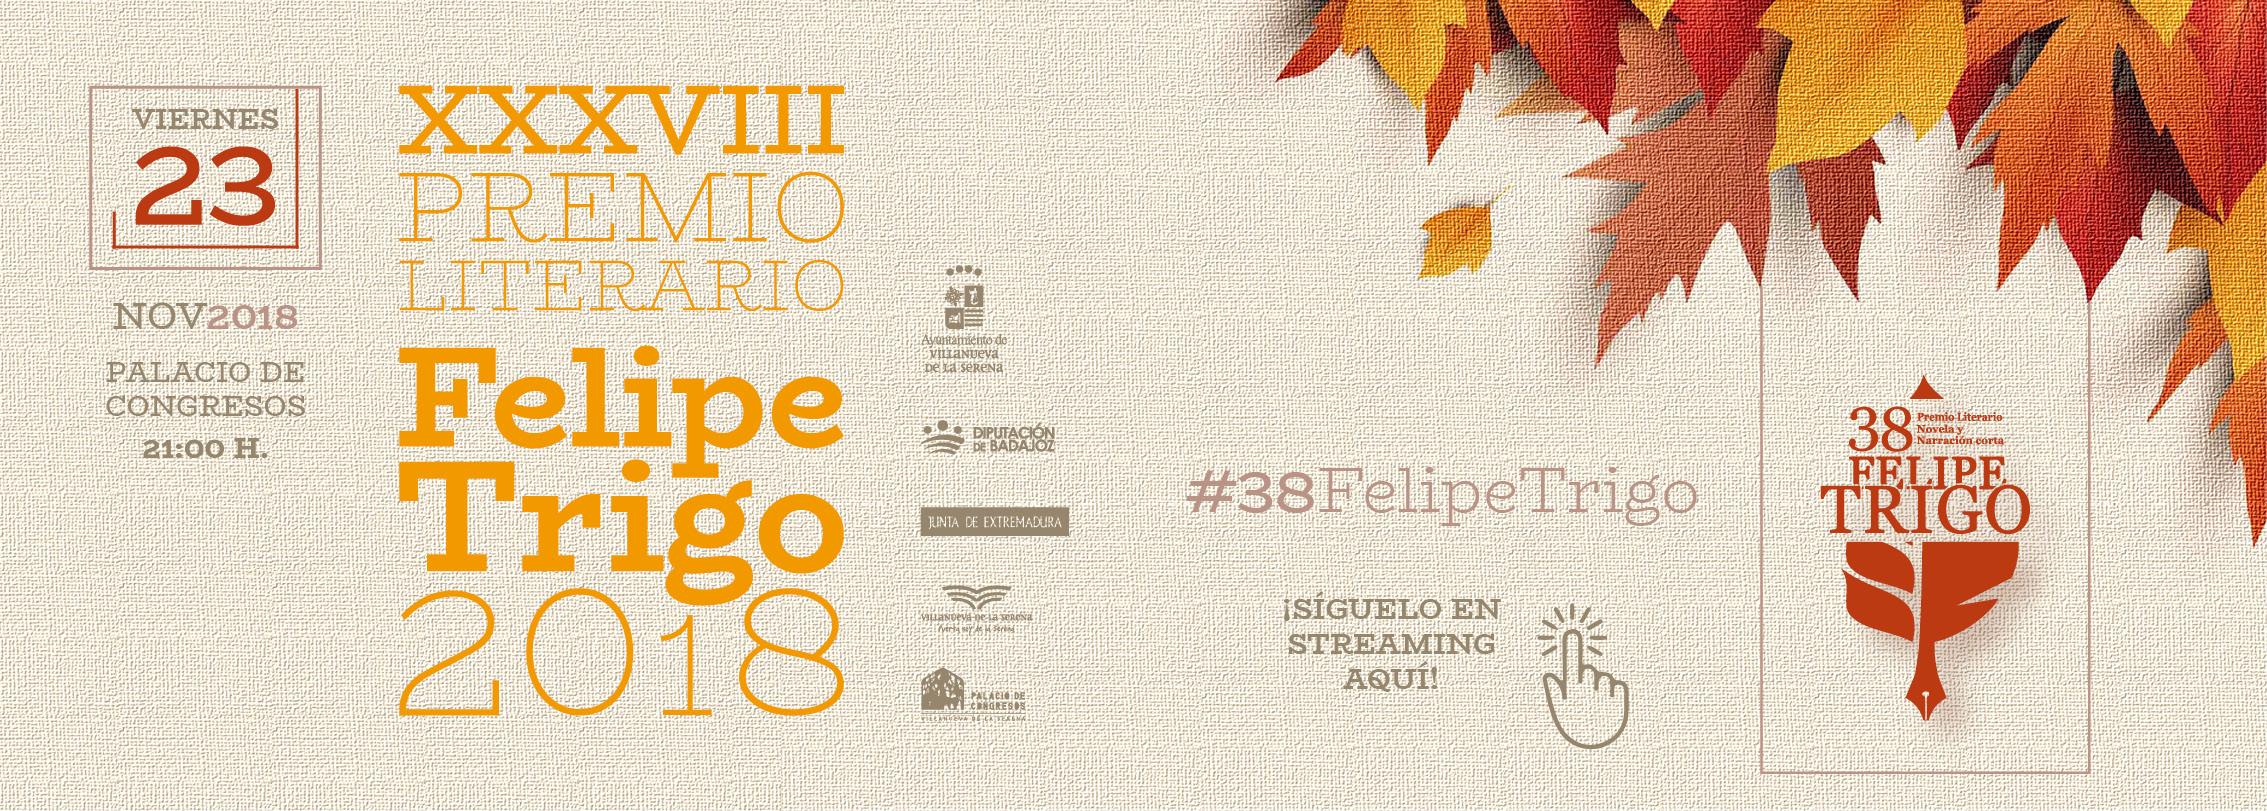 FELIPE TRIGO 2018 WEB 40aa9